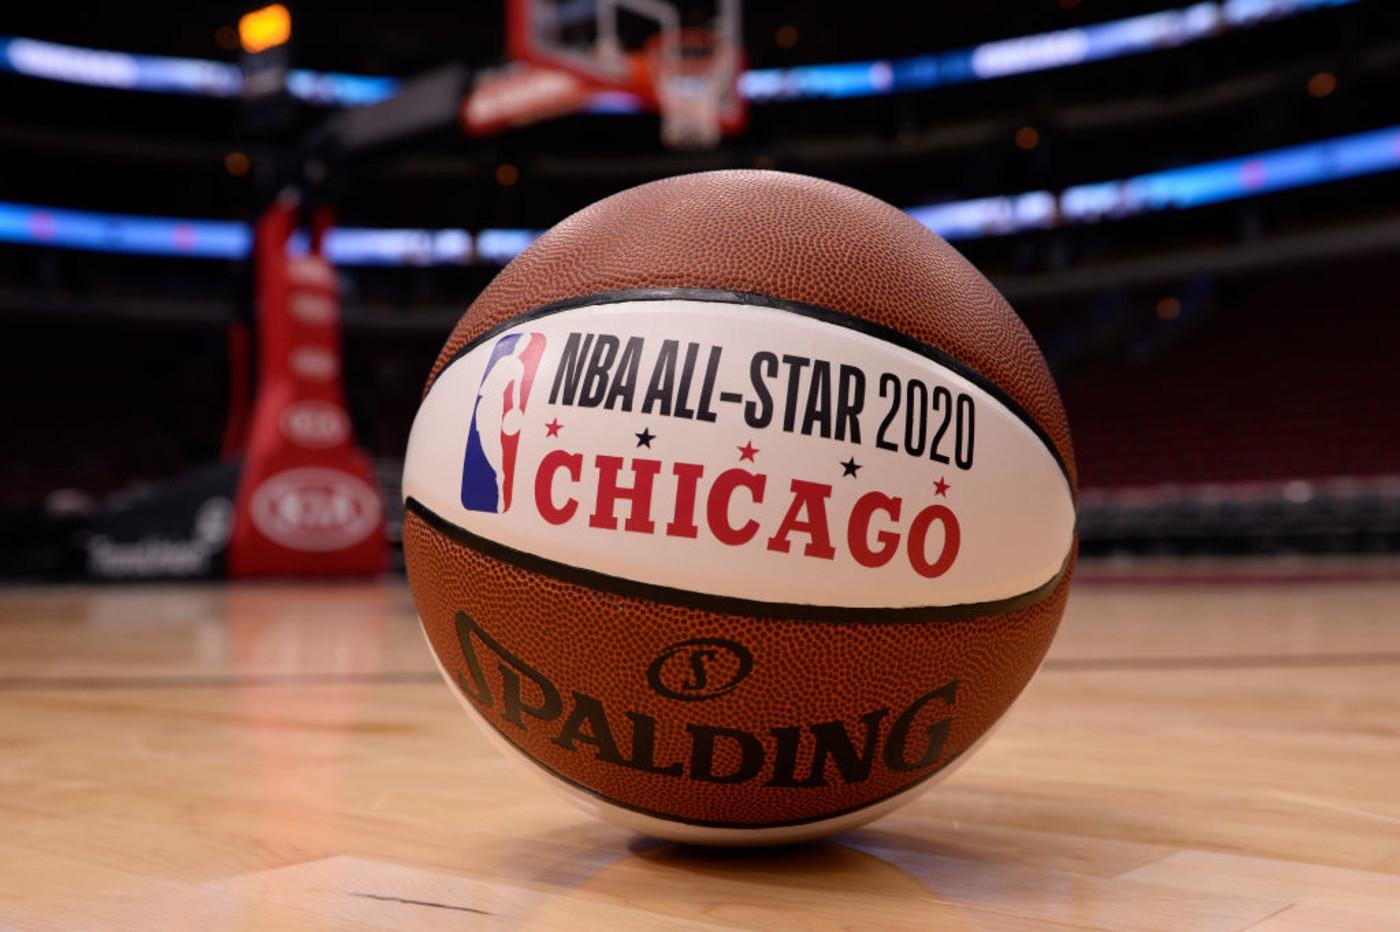 NBA All-Star Chicago 2020 Basketball United Center